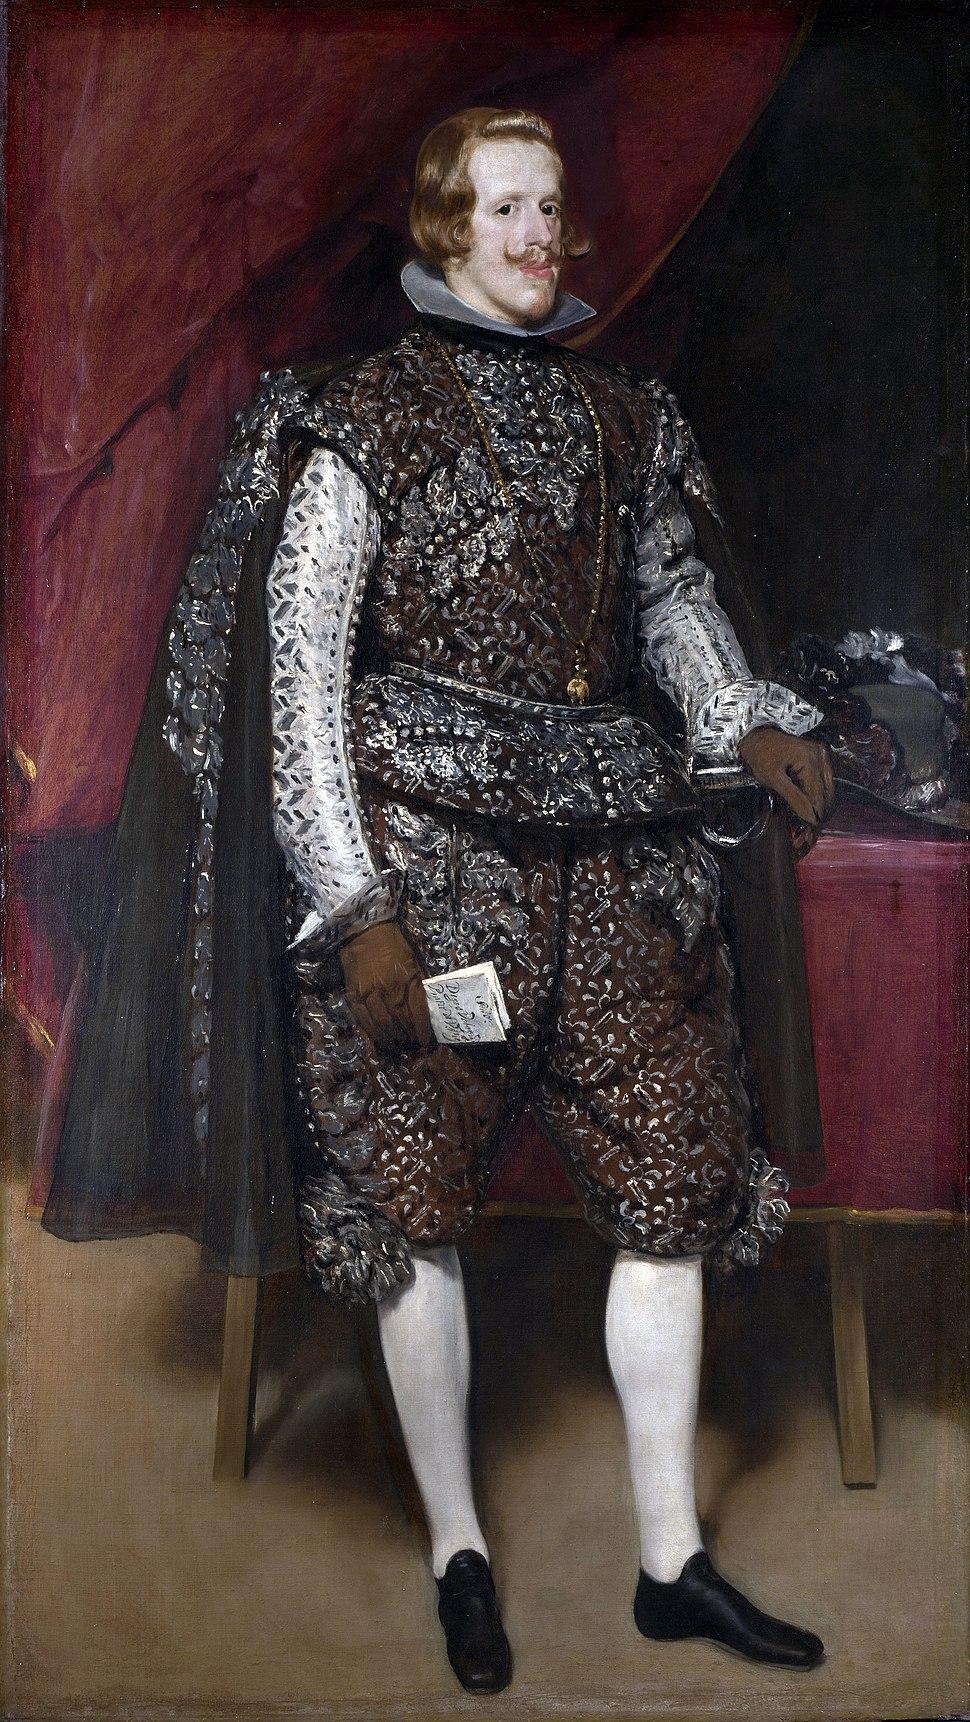 Felipe IV de castaño y plata, by Diego Velázquez